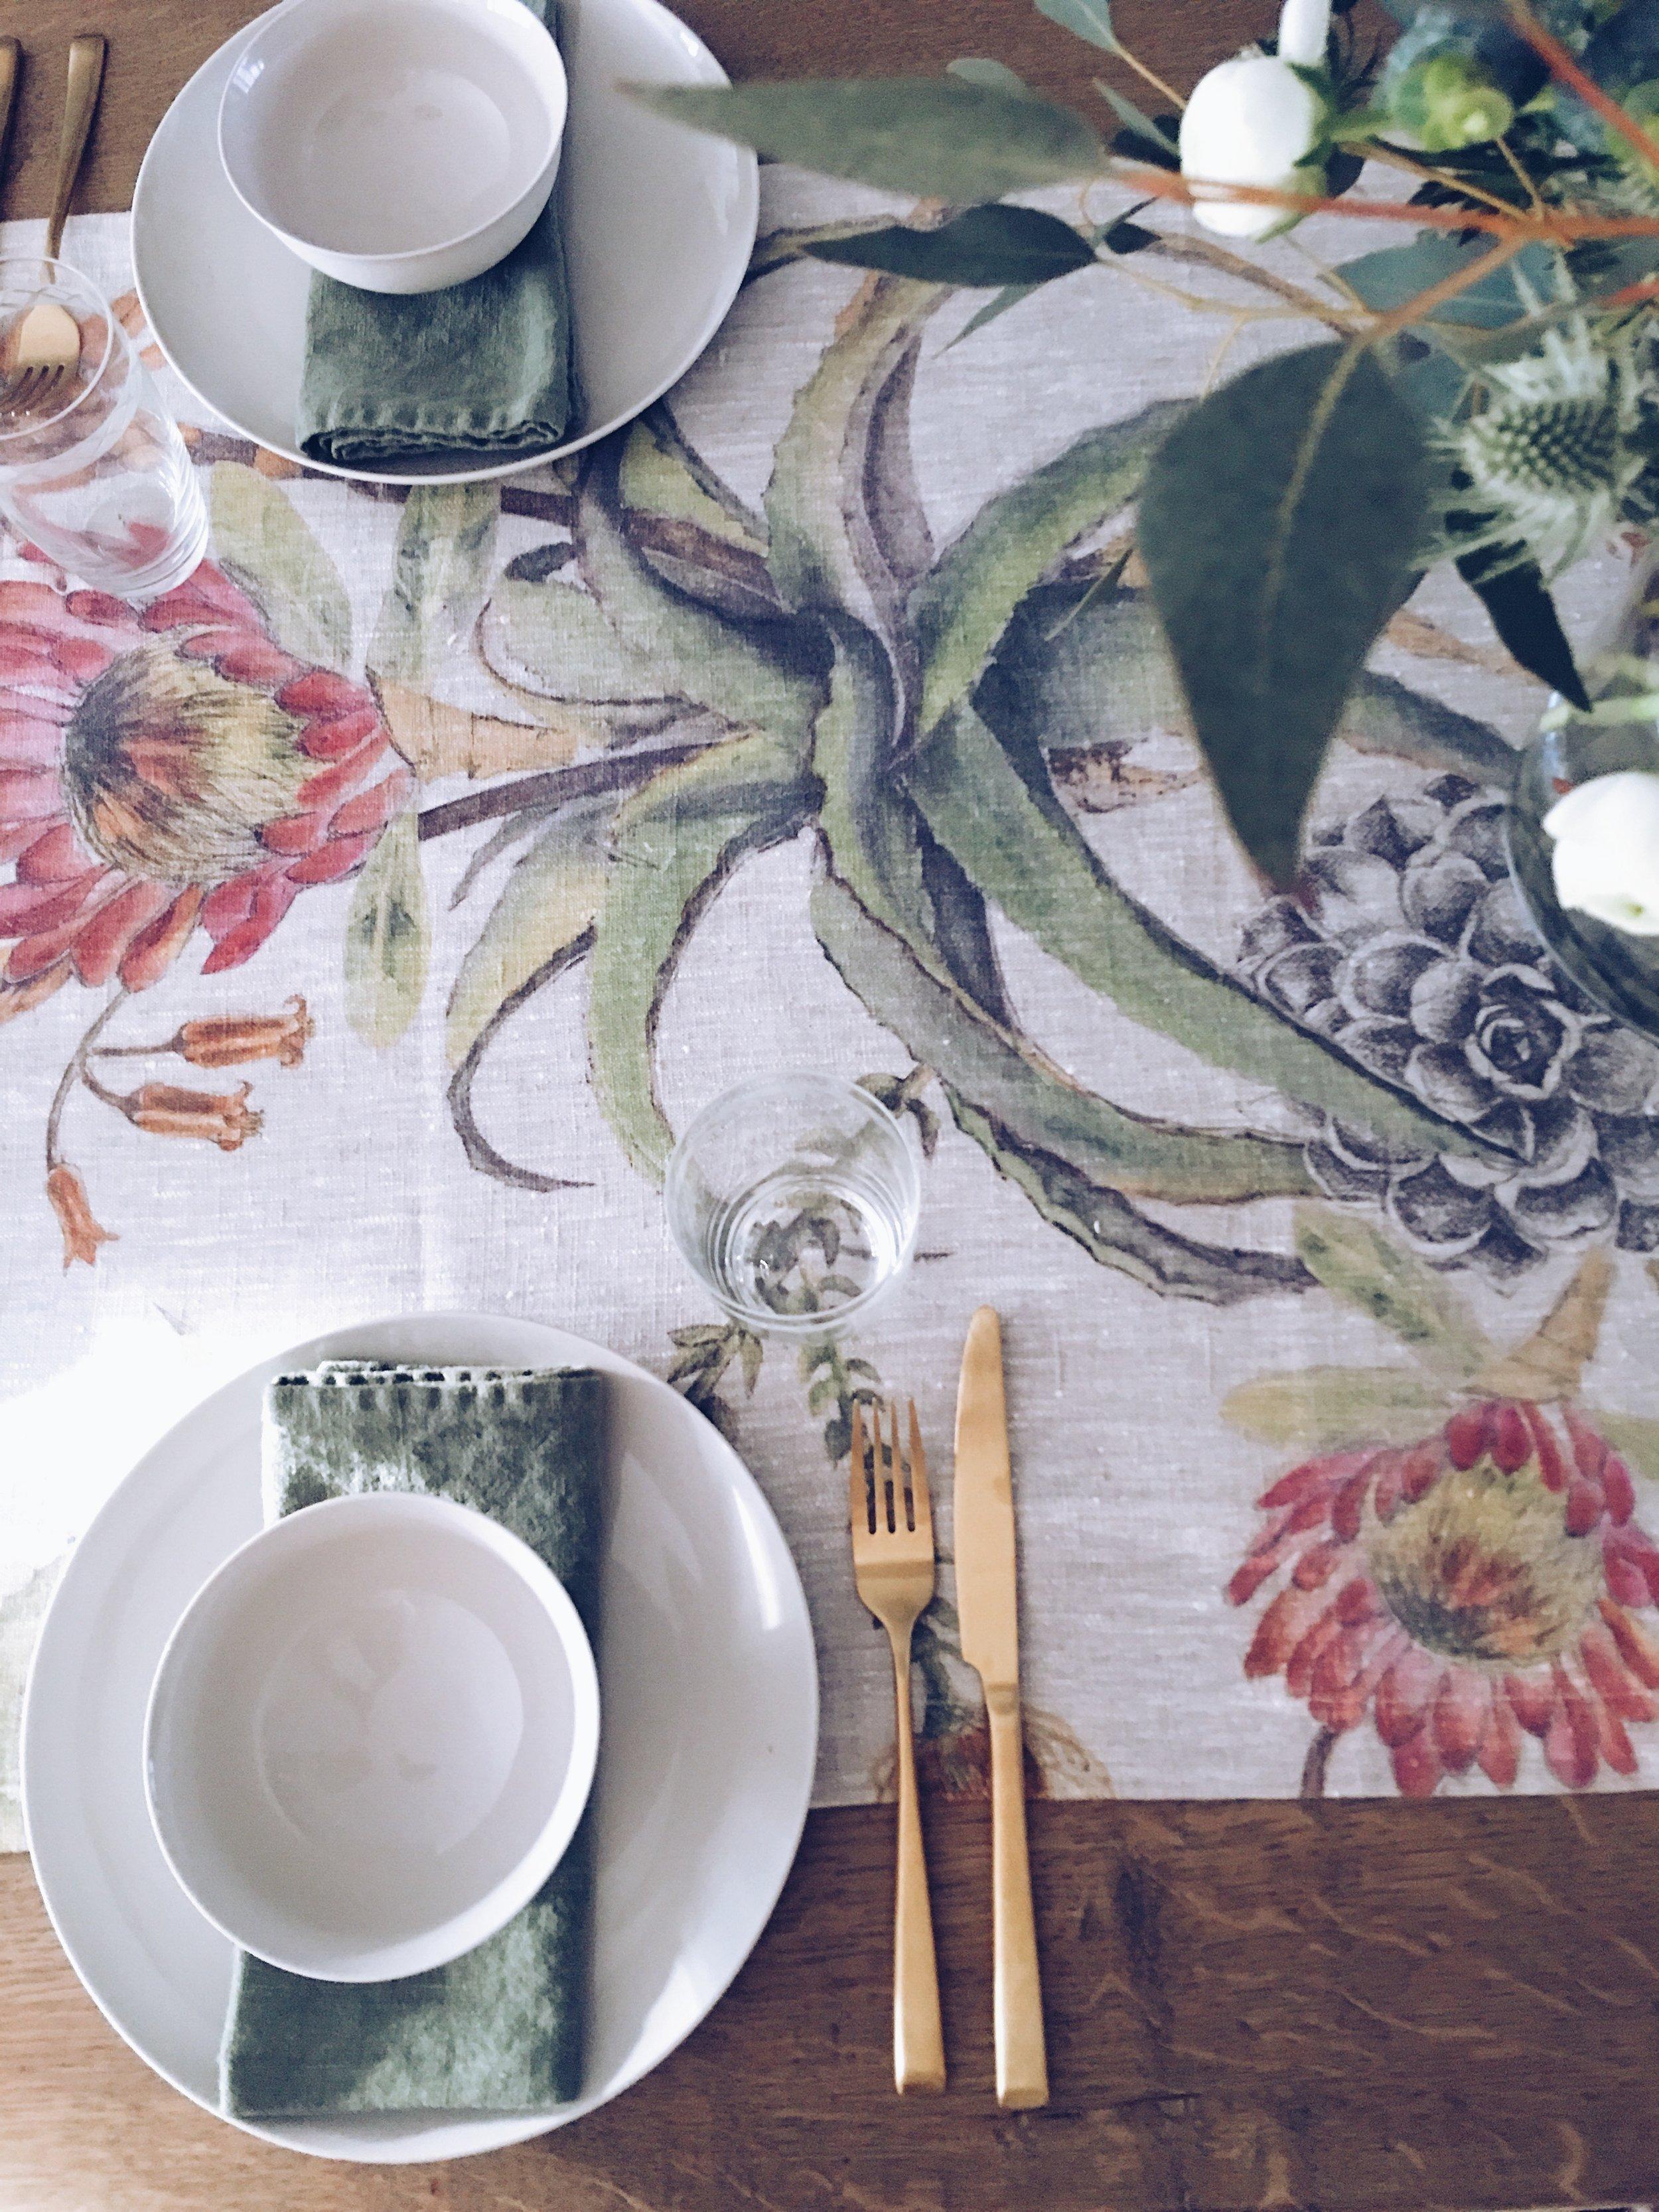 Tablescape- plates and bowls courtesy of @botanyshope5